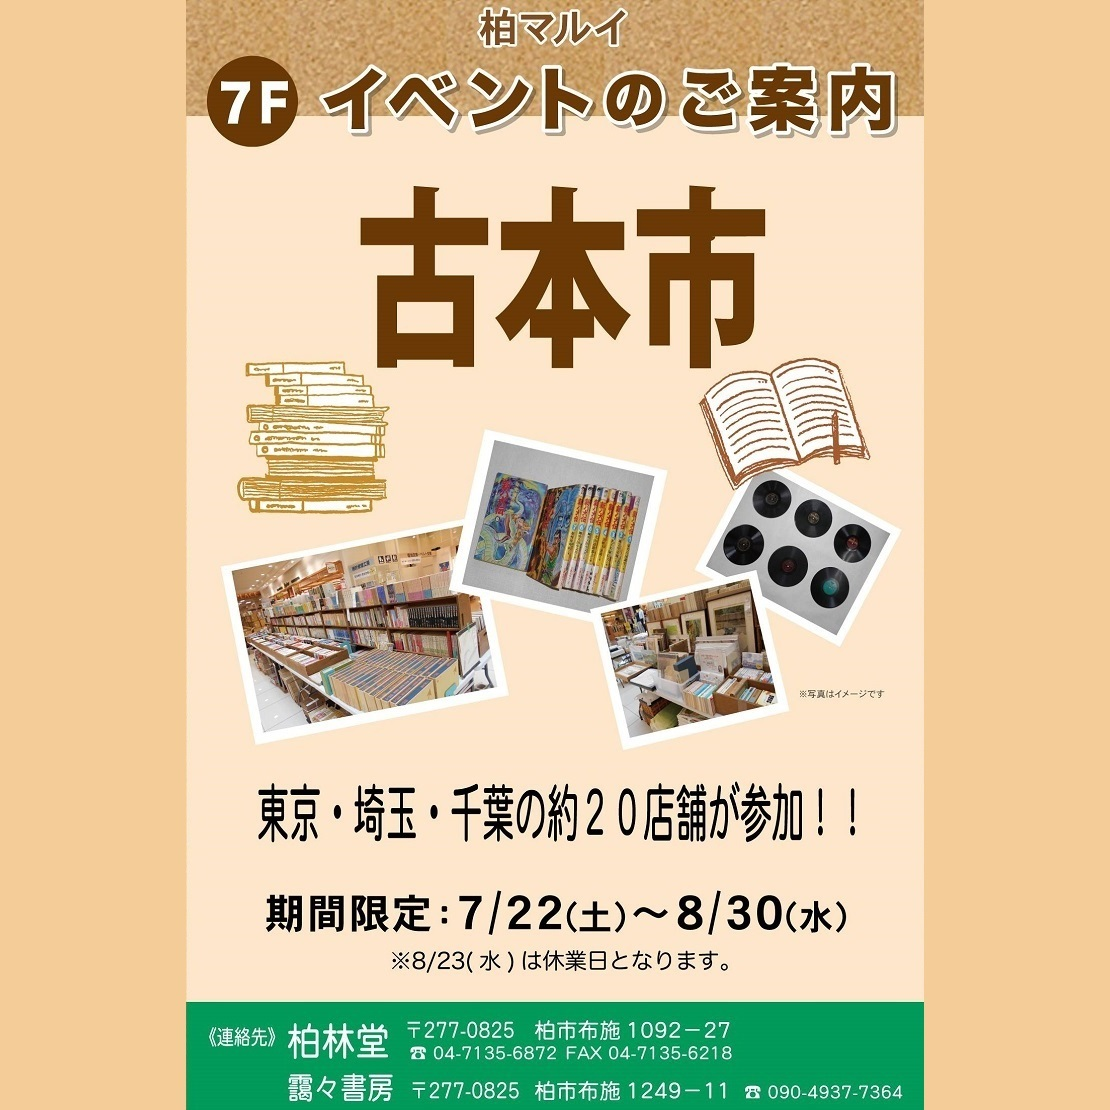 Kashiwa-marui-huruhonichi02.jpg